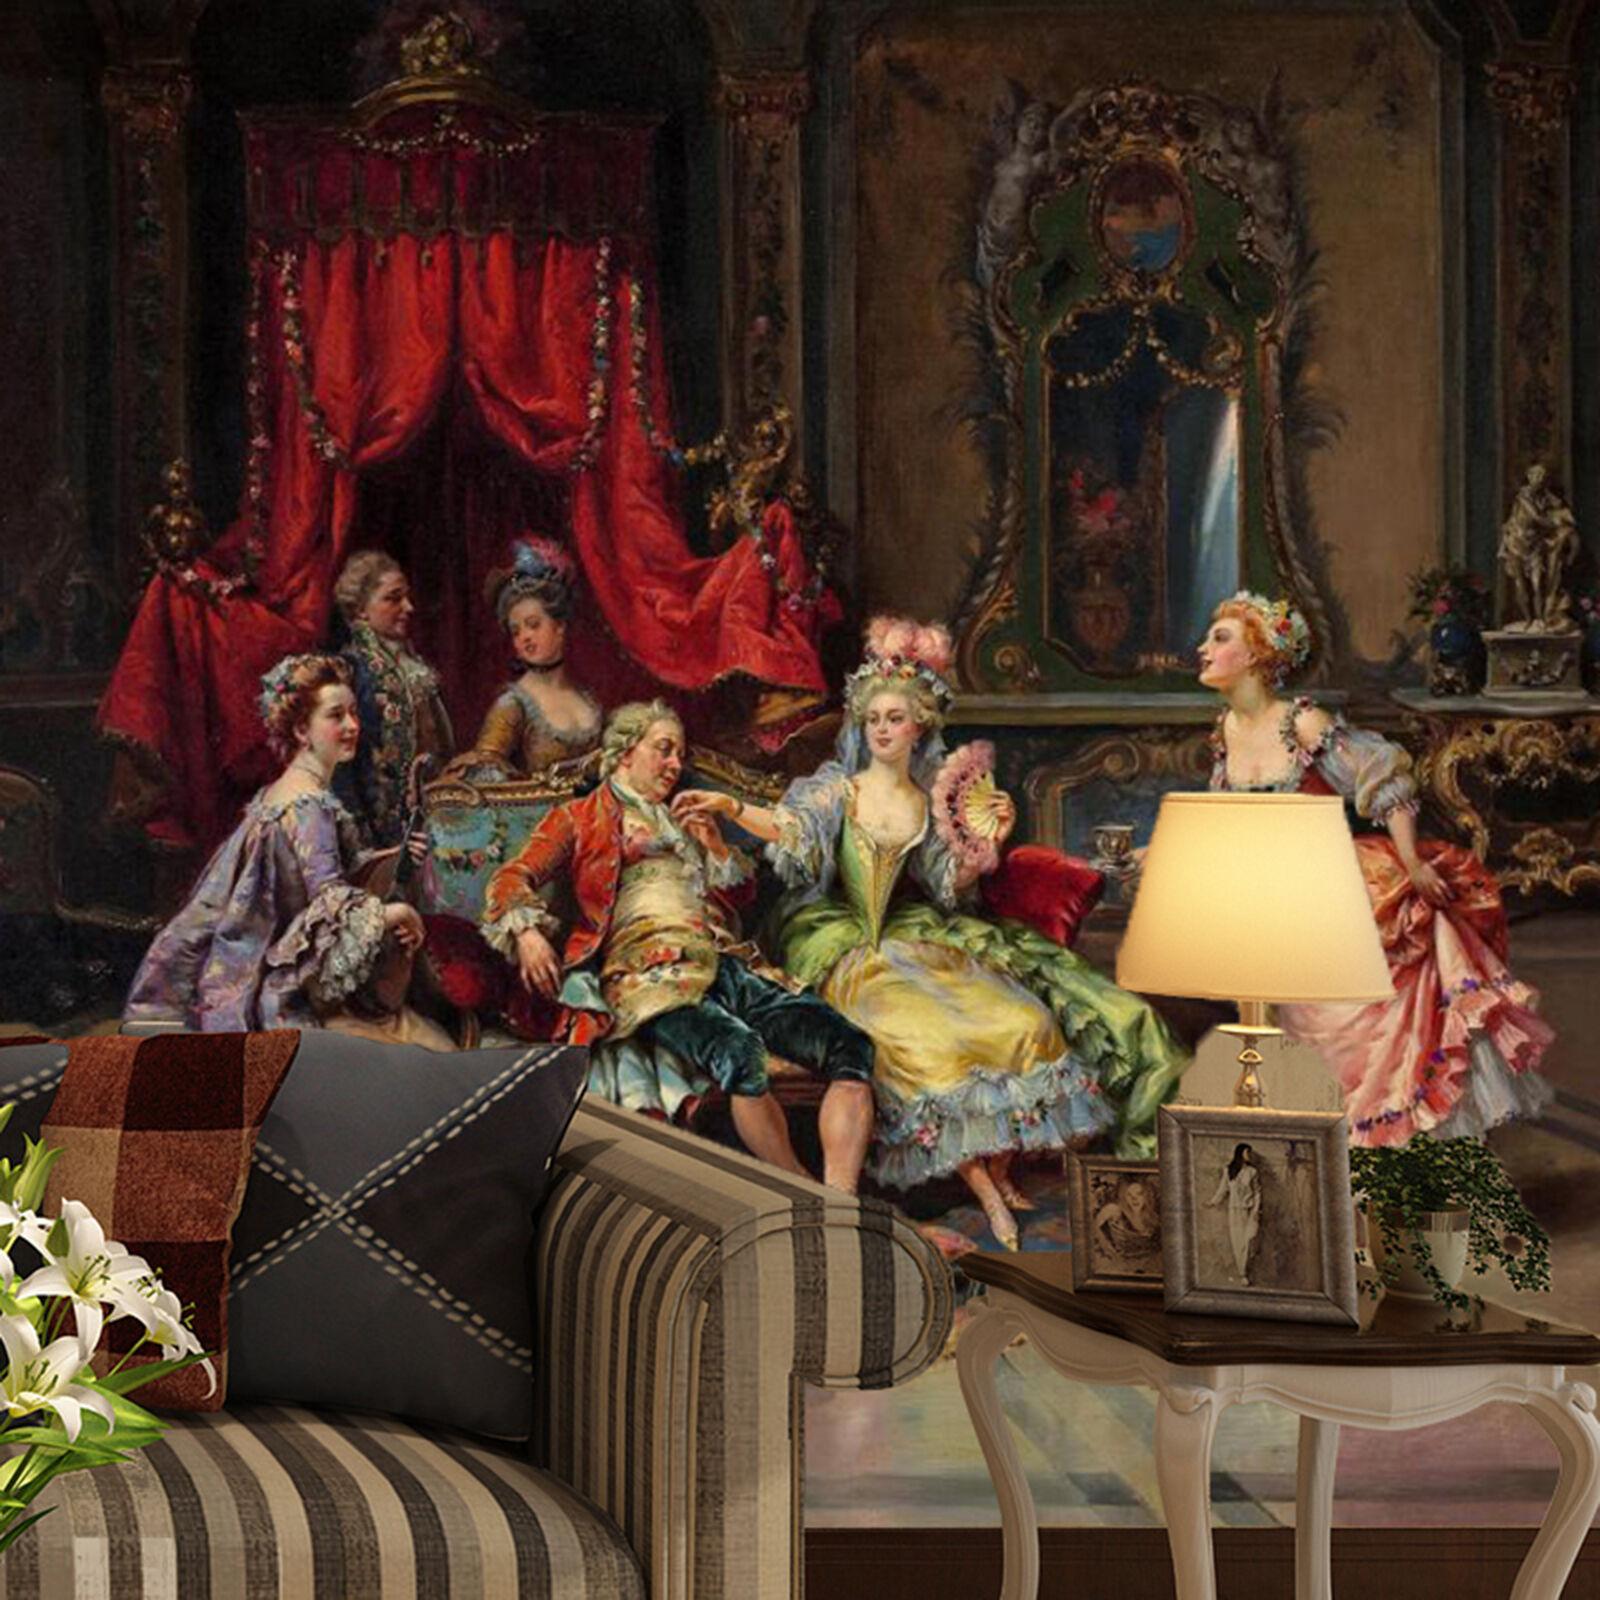 3D In hand 1155 Fototapeten Wandbild Fototapete Bild Tapete Familie Kinder DE